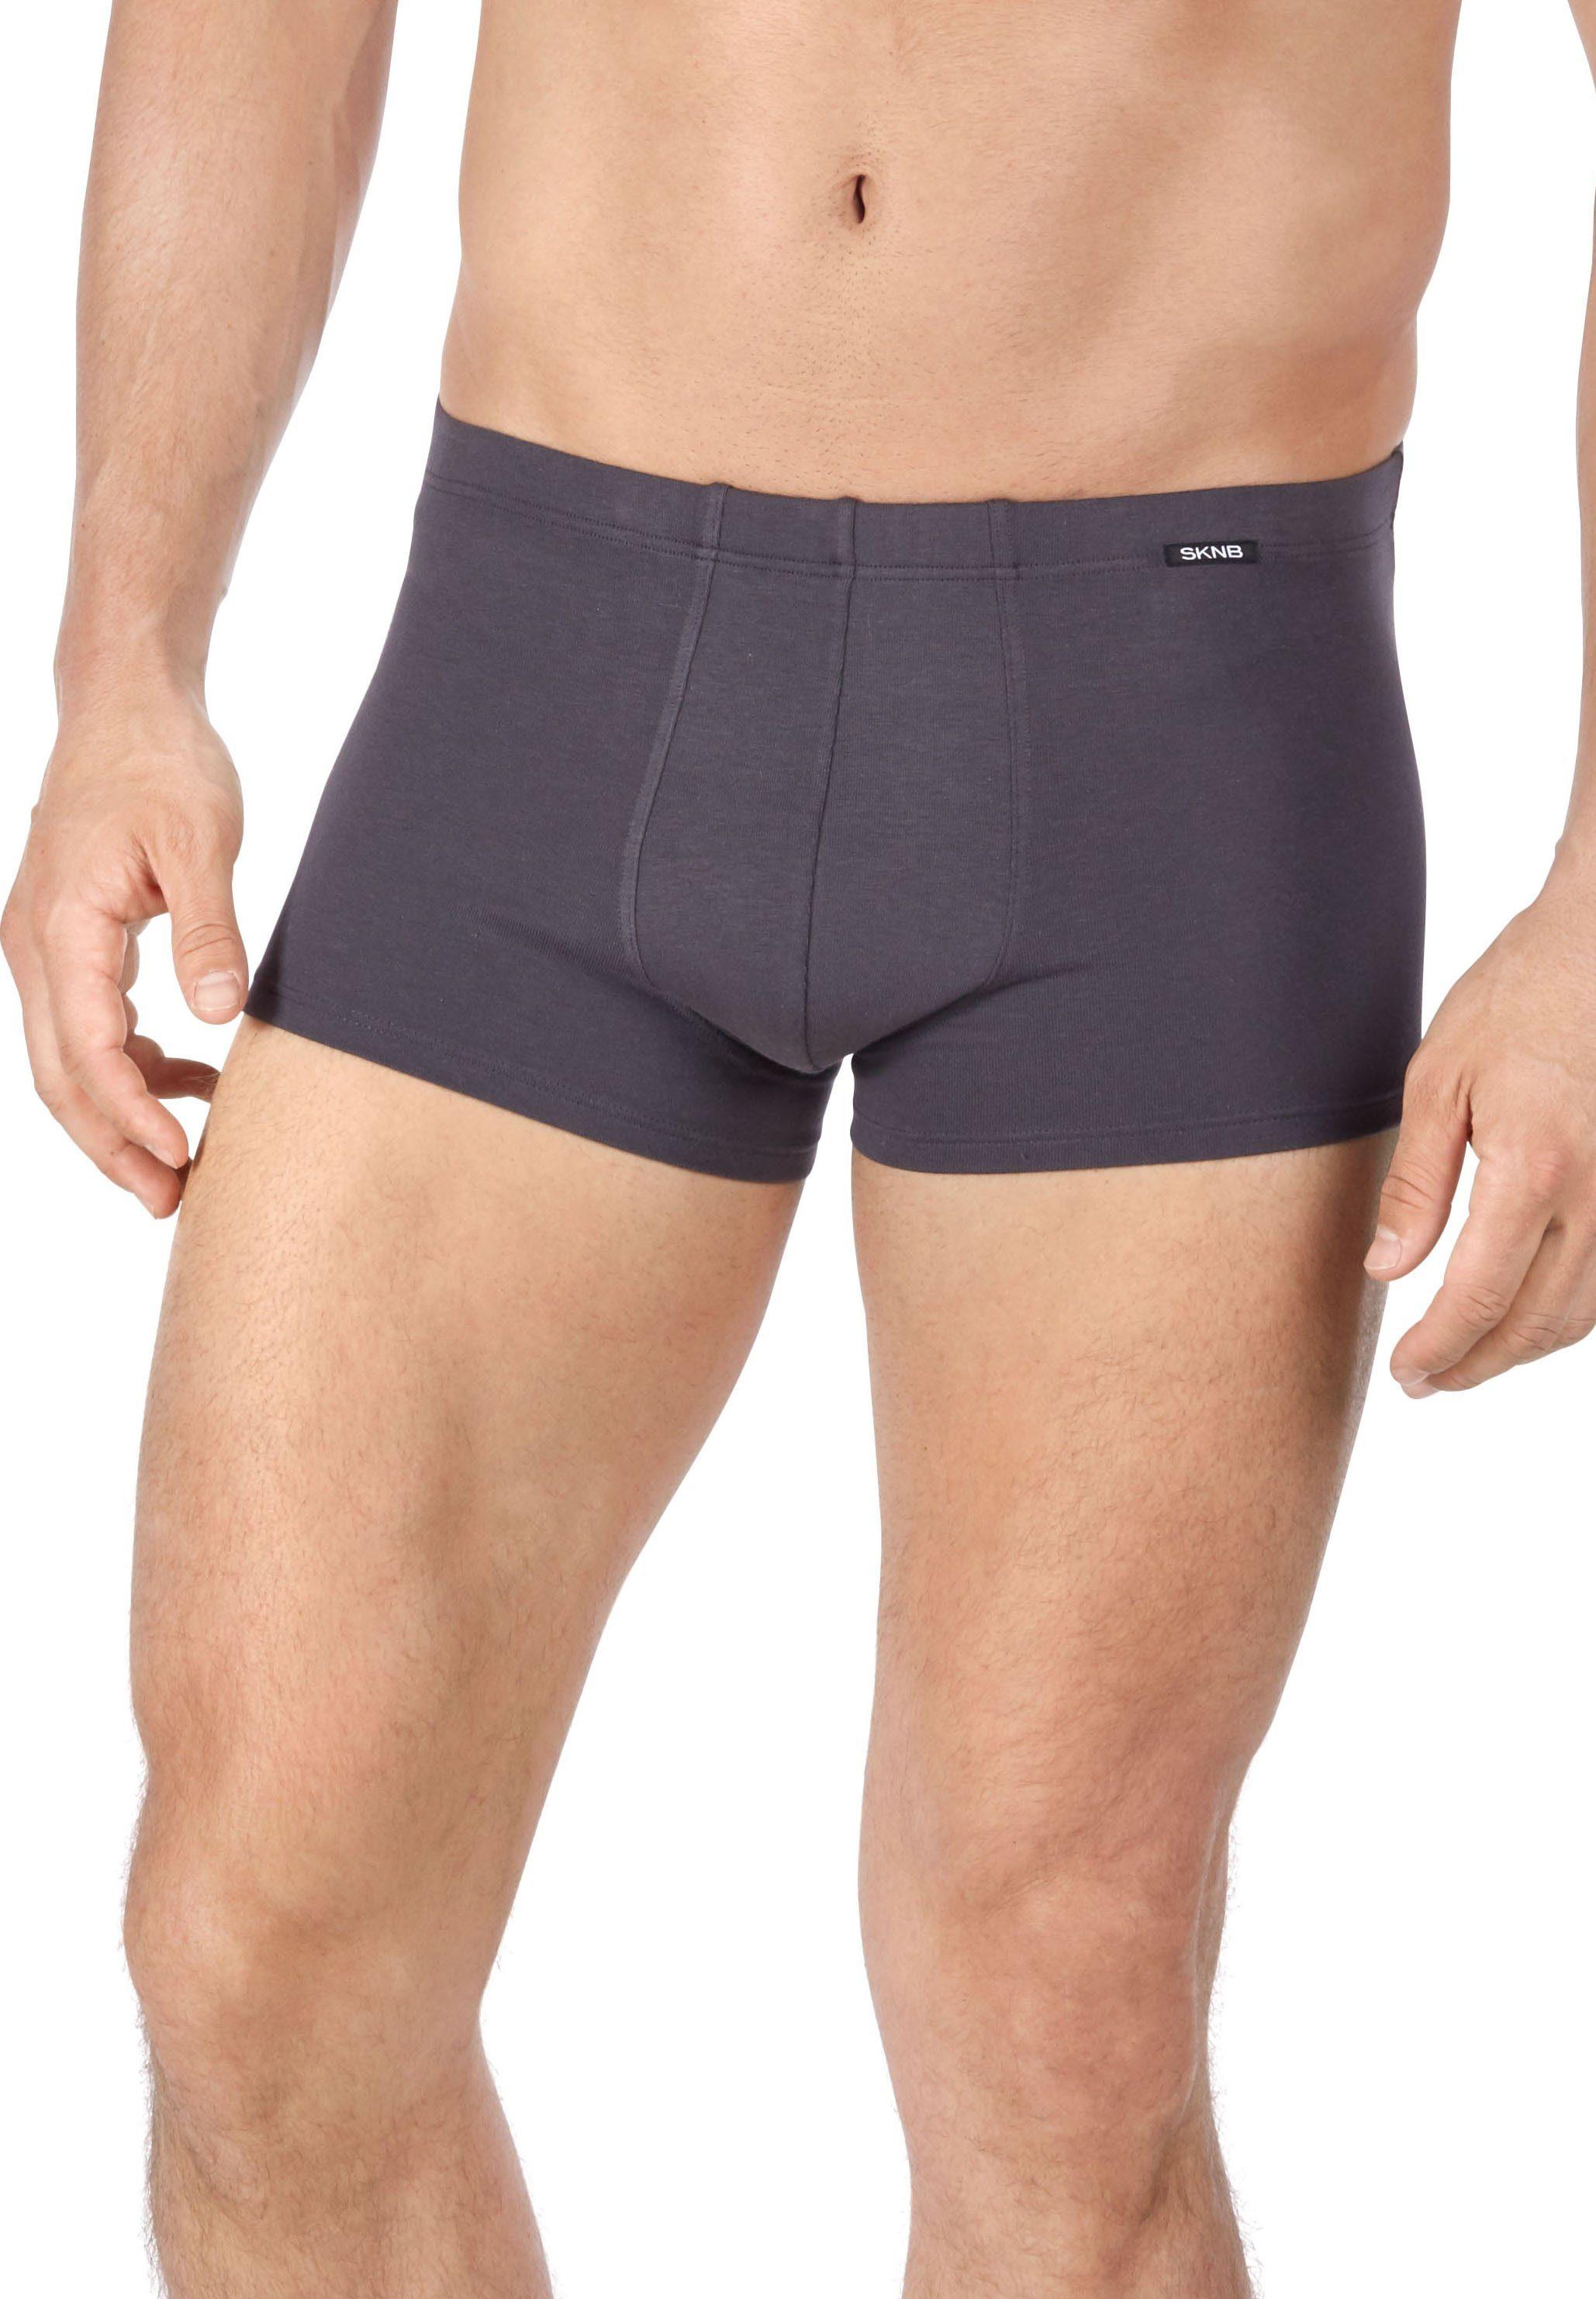 Skiny Panties 2er-Pack der Advantage Men-Serie in schlichtem Design